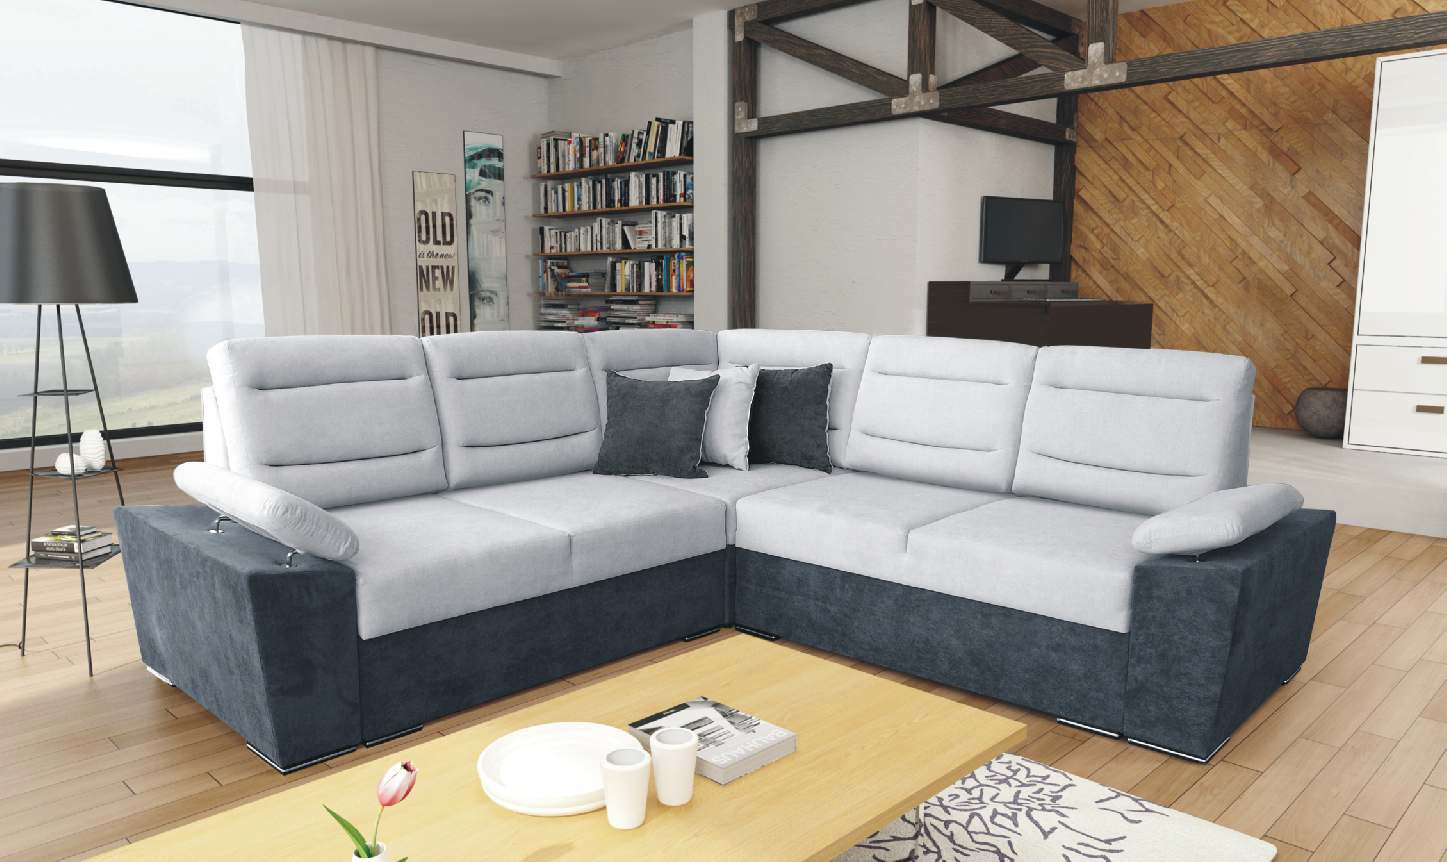 Groovy Savio Two Tone Sectional Sofa By Skyler Designs Creativecarmelina Interior Chair Design Creativecarmelinacom